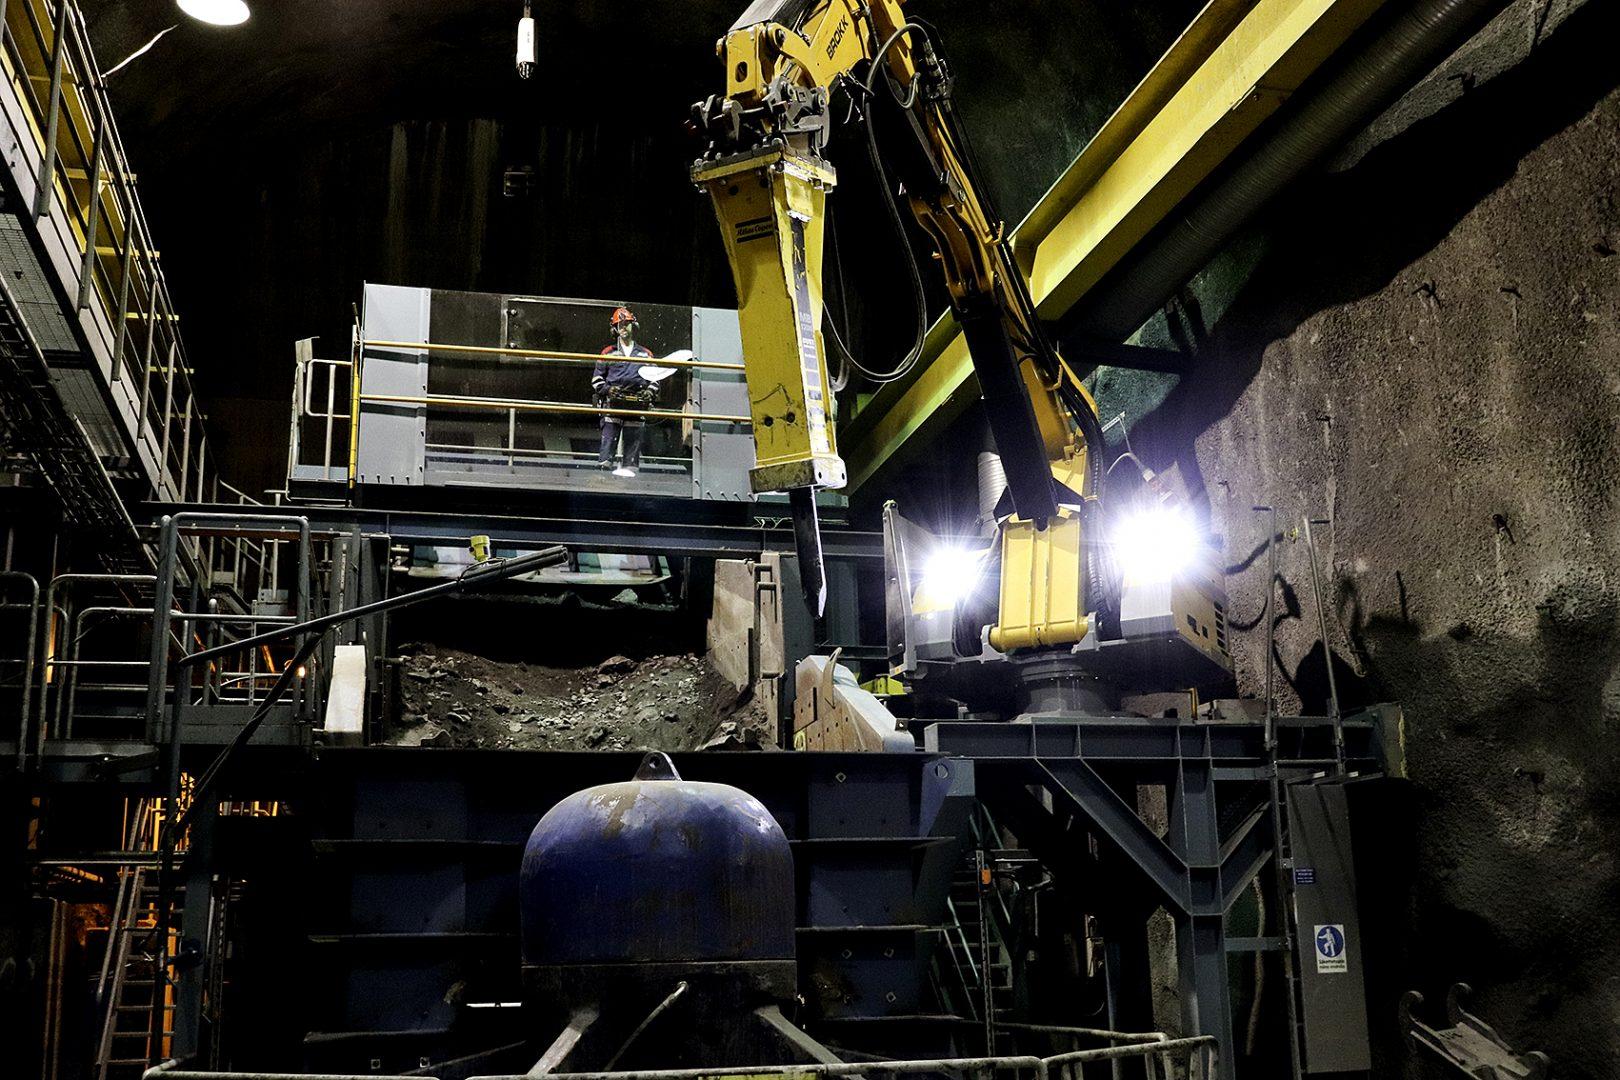 A Brokk Pedestal Boom unit uses its breaker in a mine.